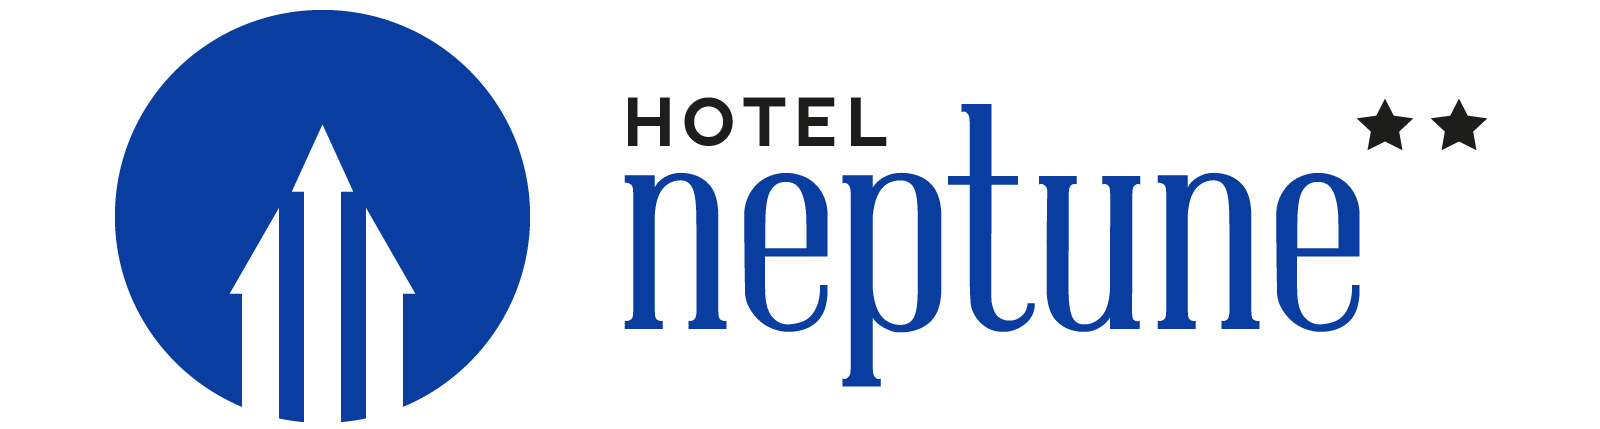 Hotel Neptune 21